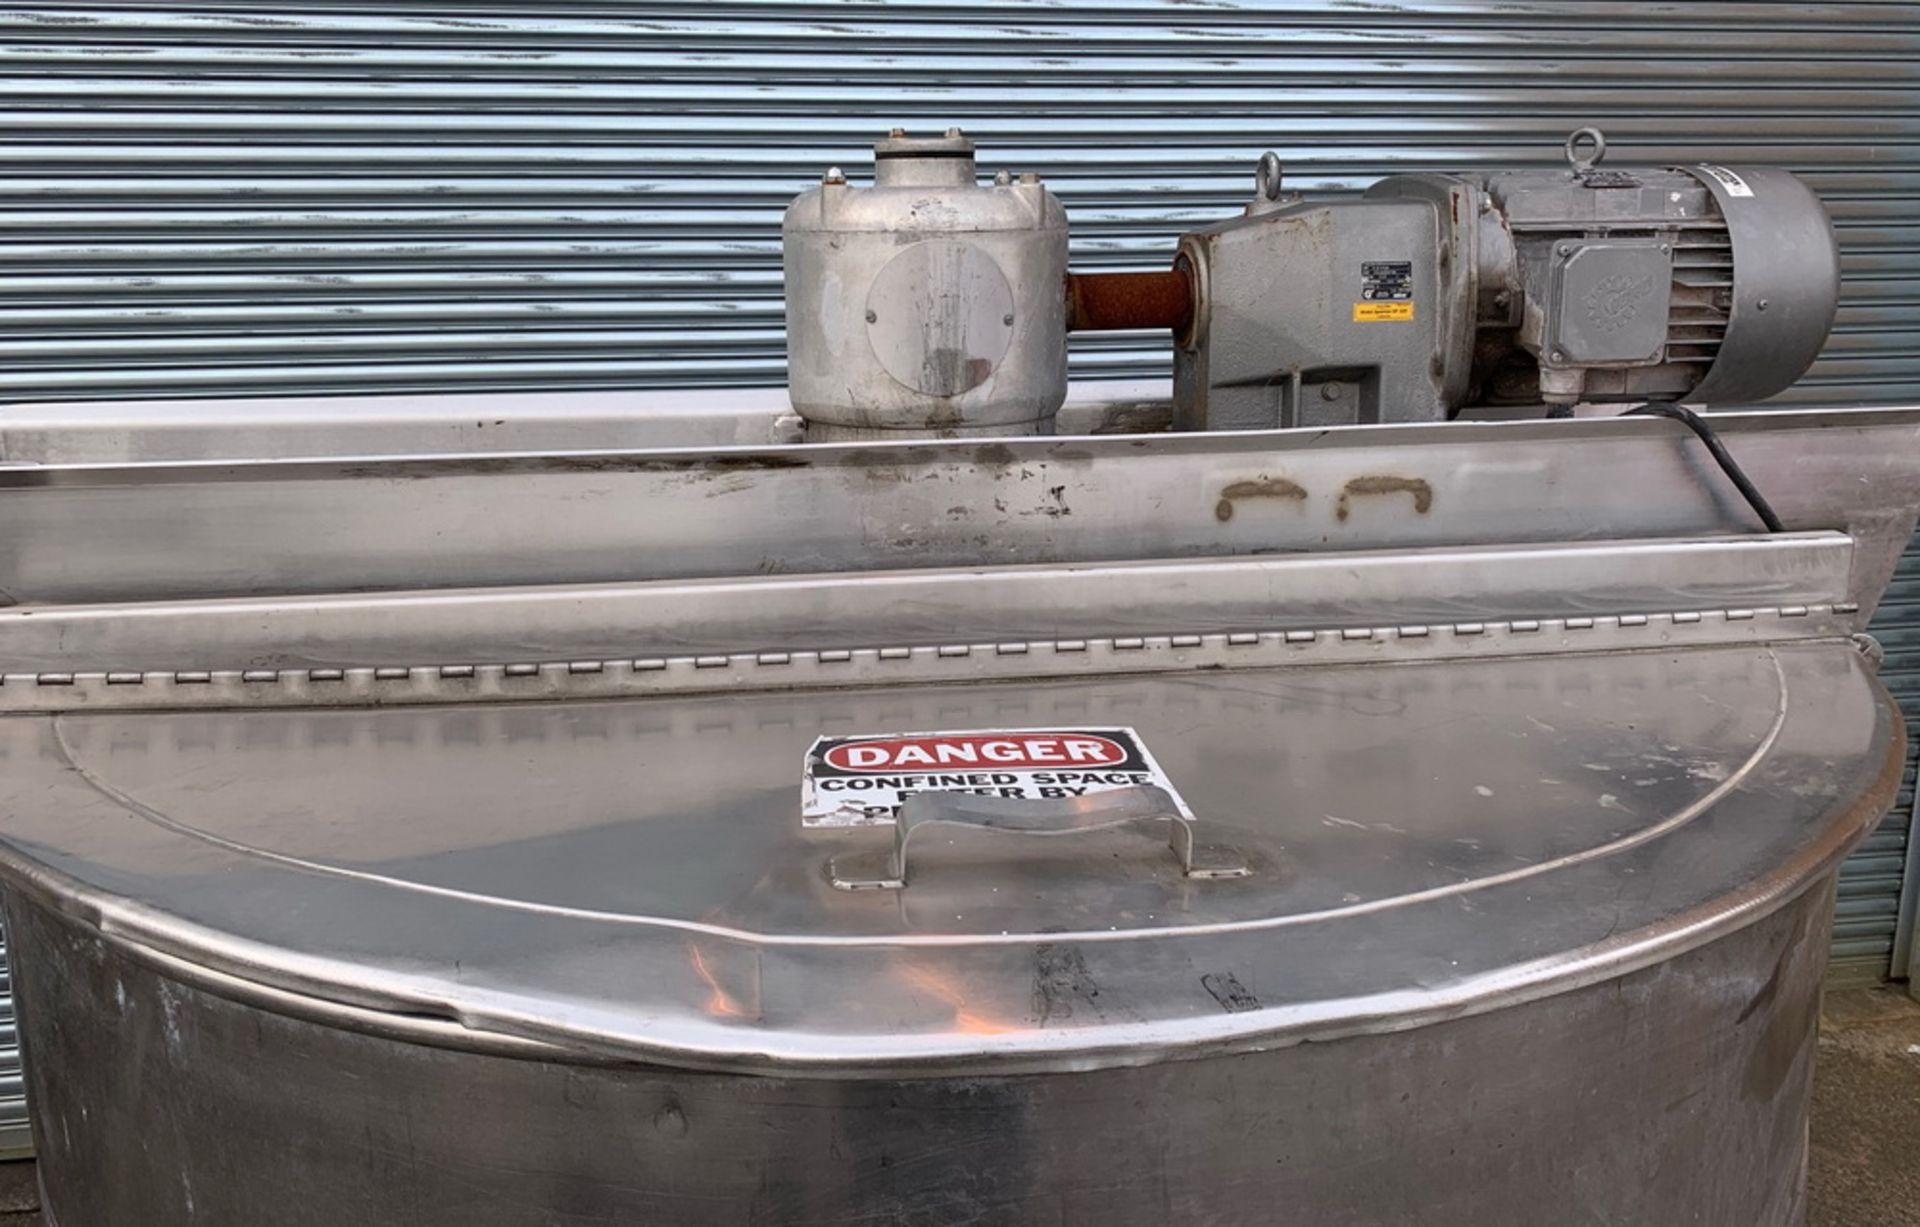 Lot 134 - Hamilton 500 gallon Double Motion Stainless Steel Scraper Kettle